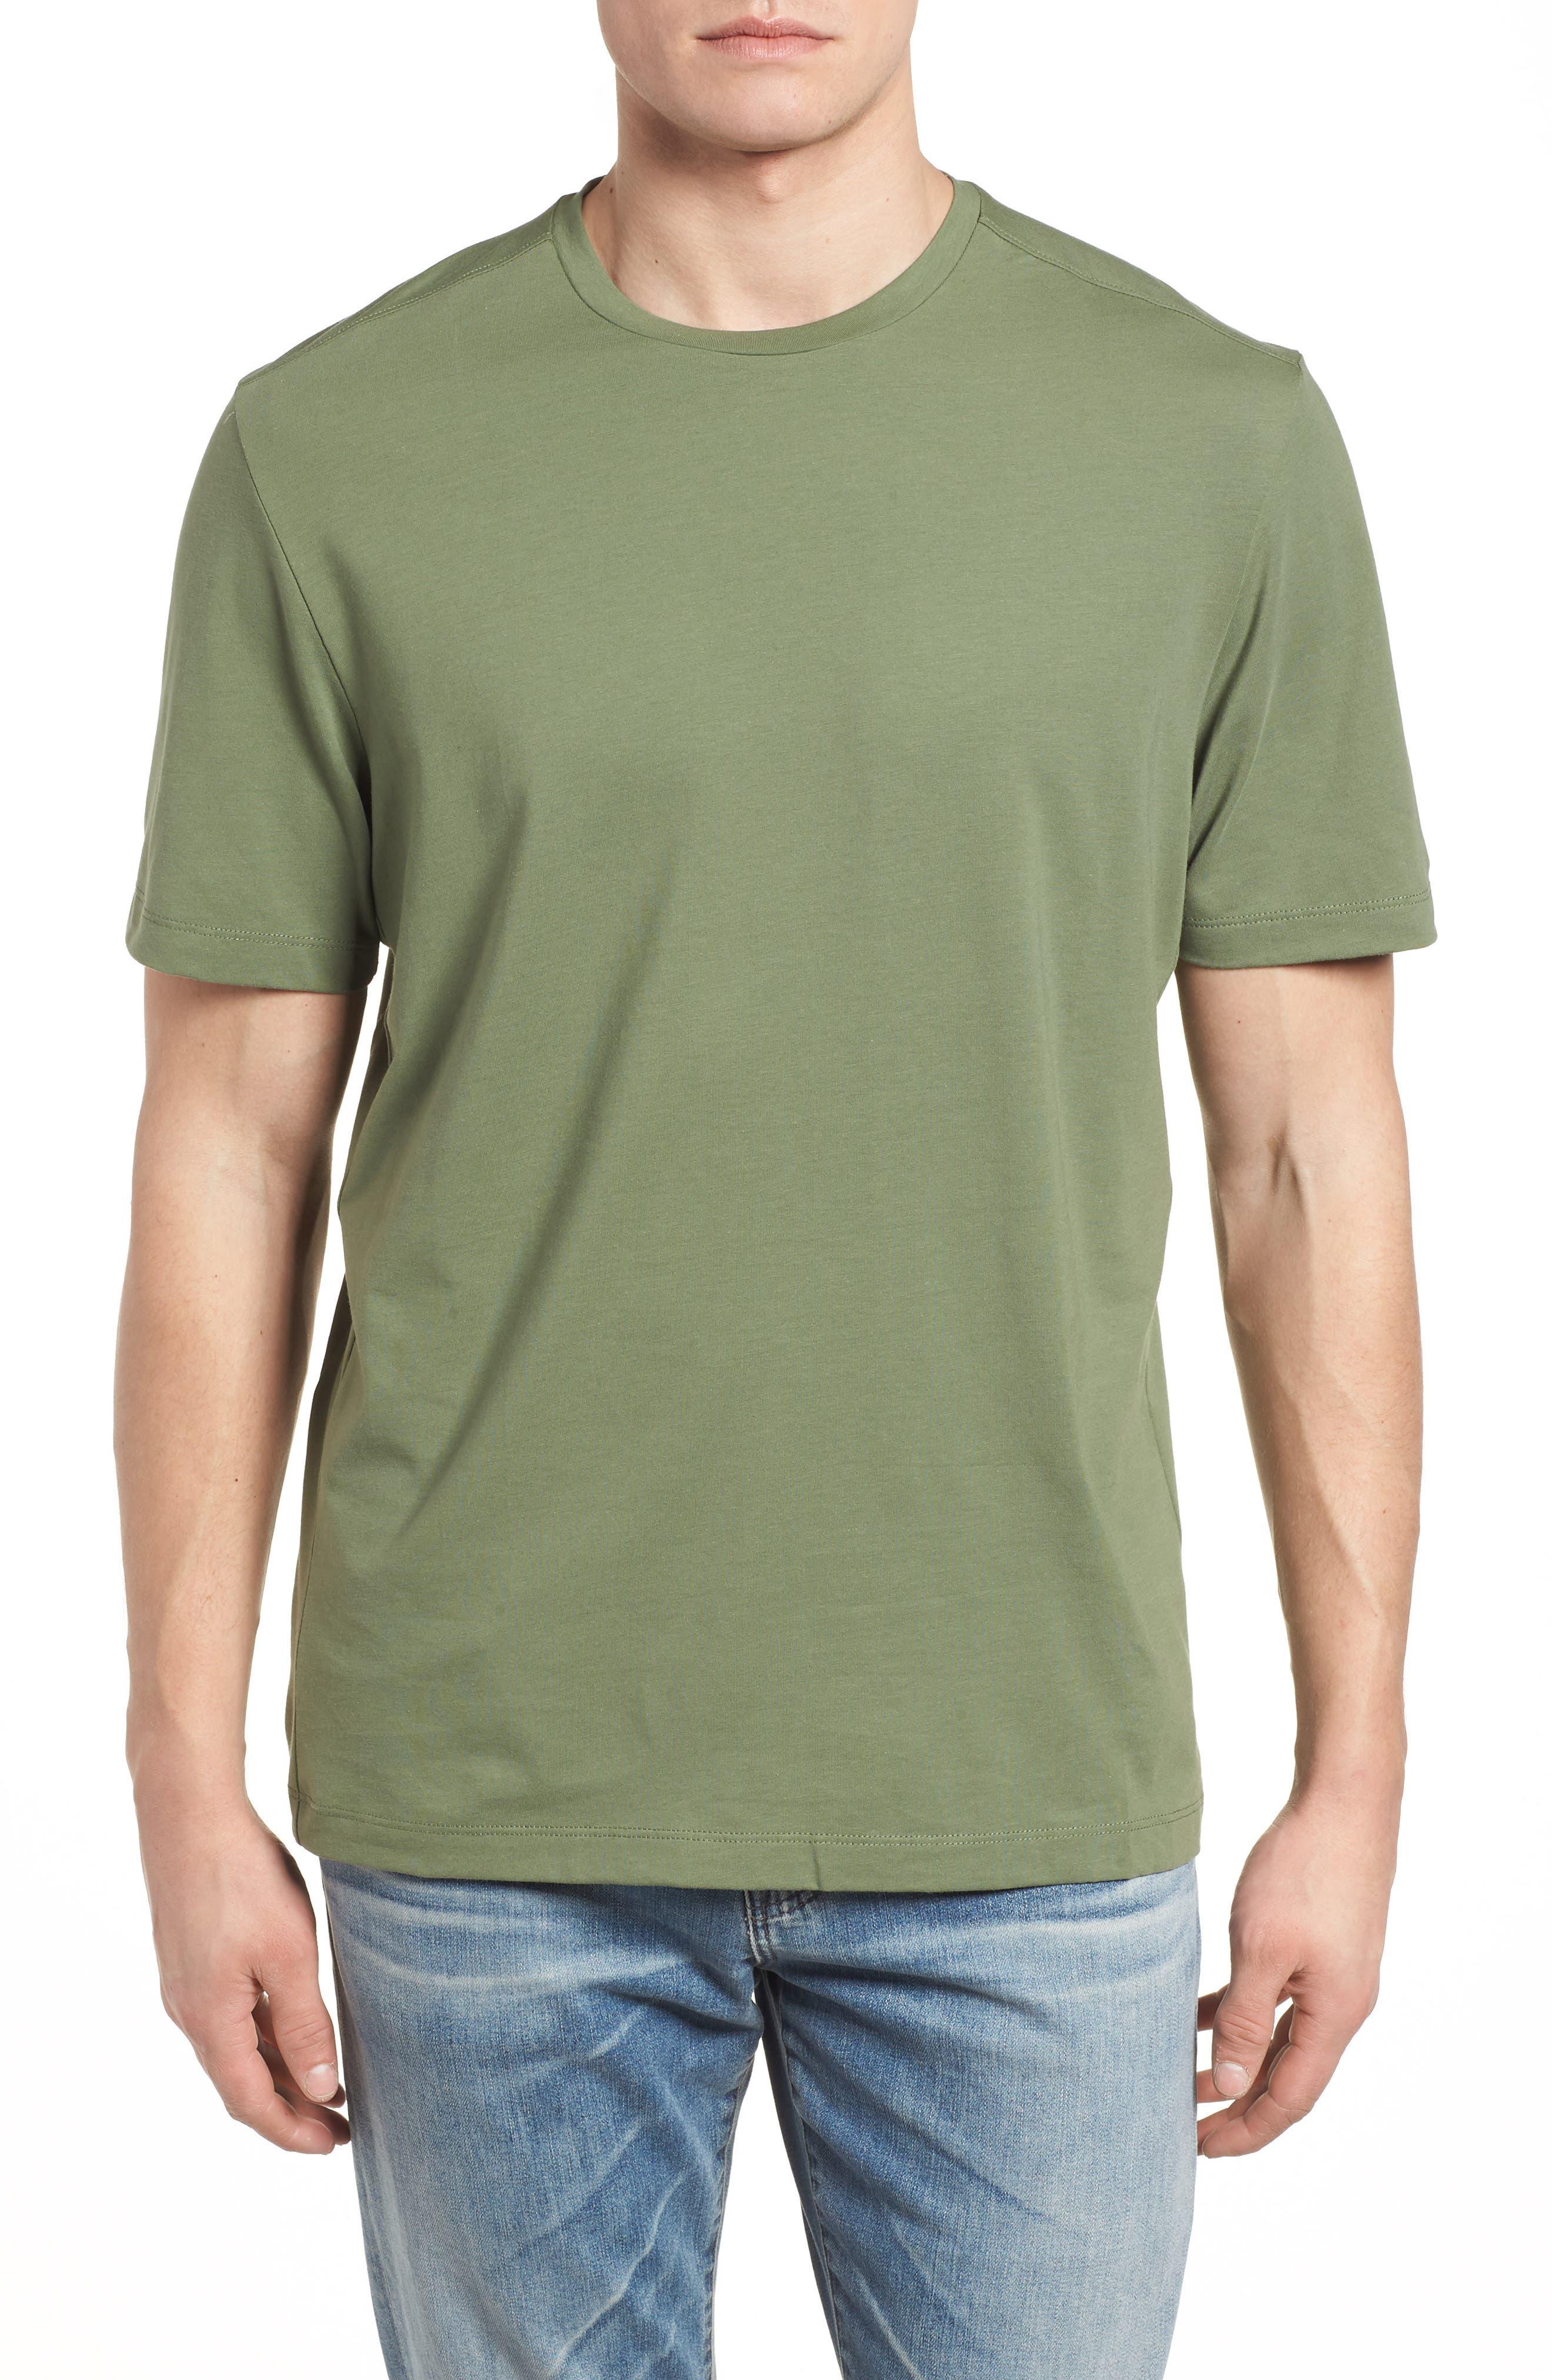 Tropicool T-Shirt,                             Main thumbnail 3, color,